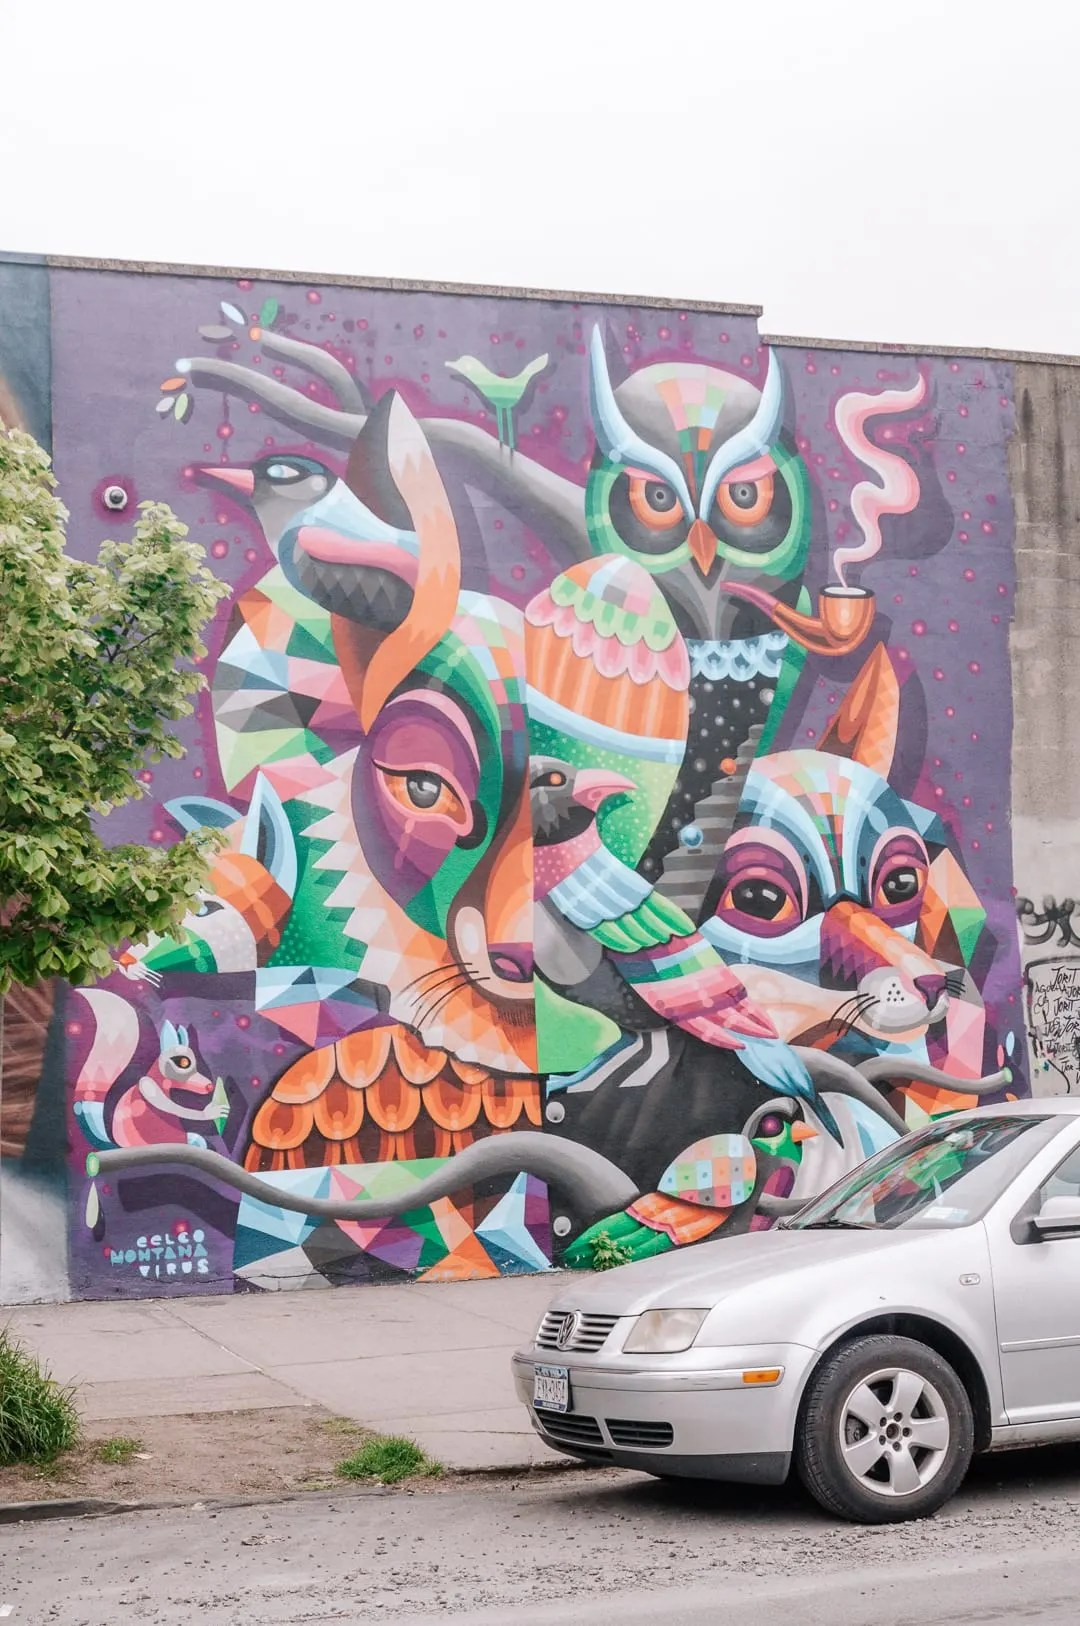 Local Insight: Where to See Bushwick Street Art and Graffiti